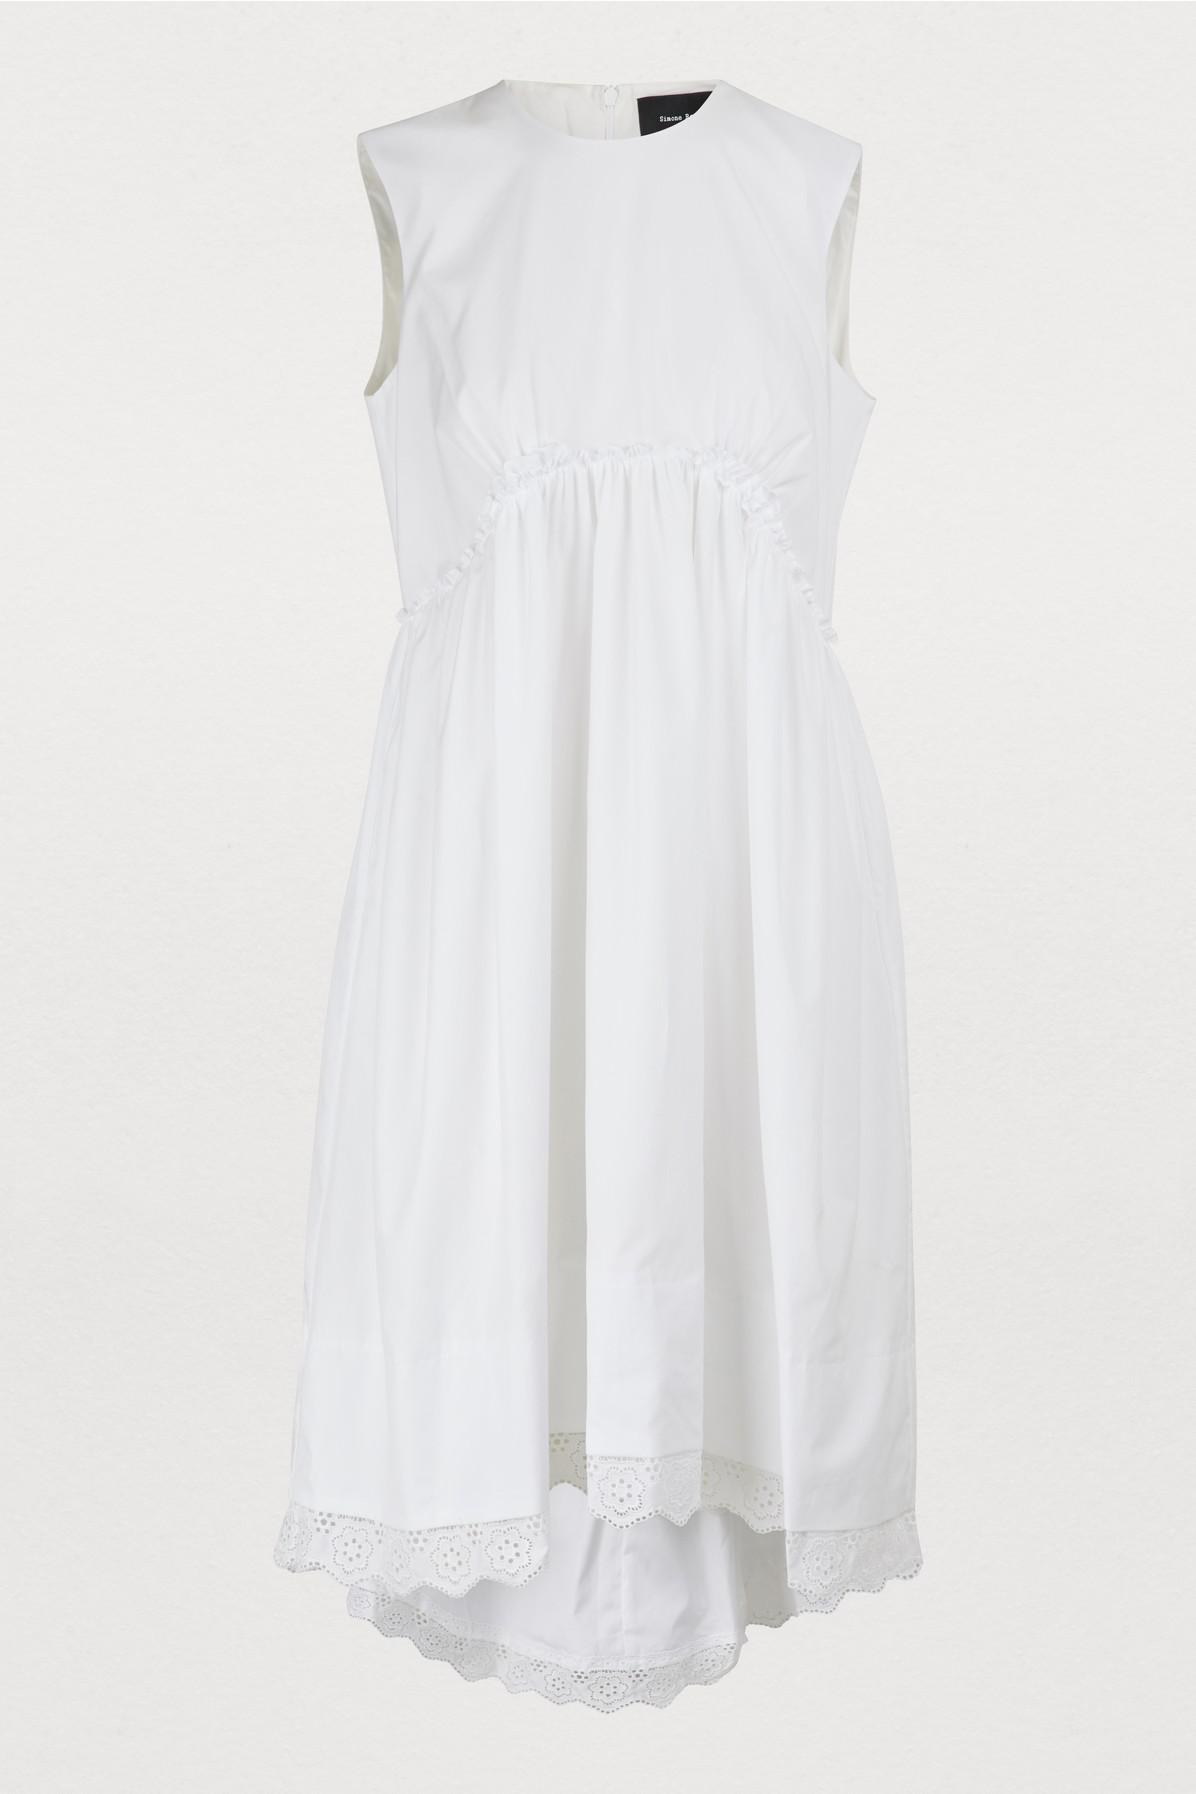 41acd9ca2867 Simone Rocha Babydoll Sleeveless Dress In White | ModeSens